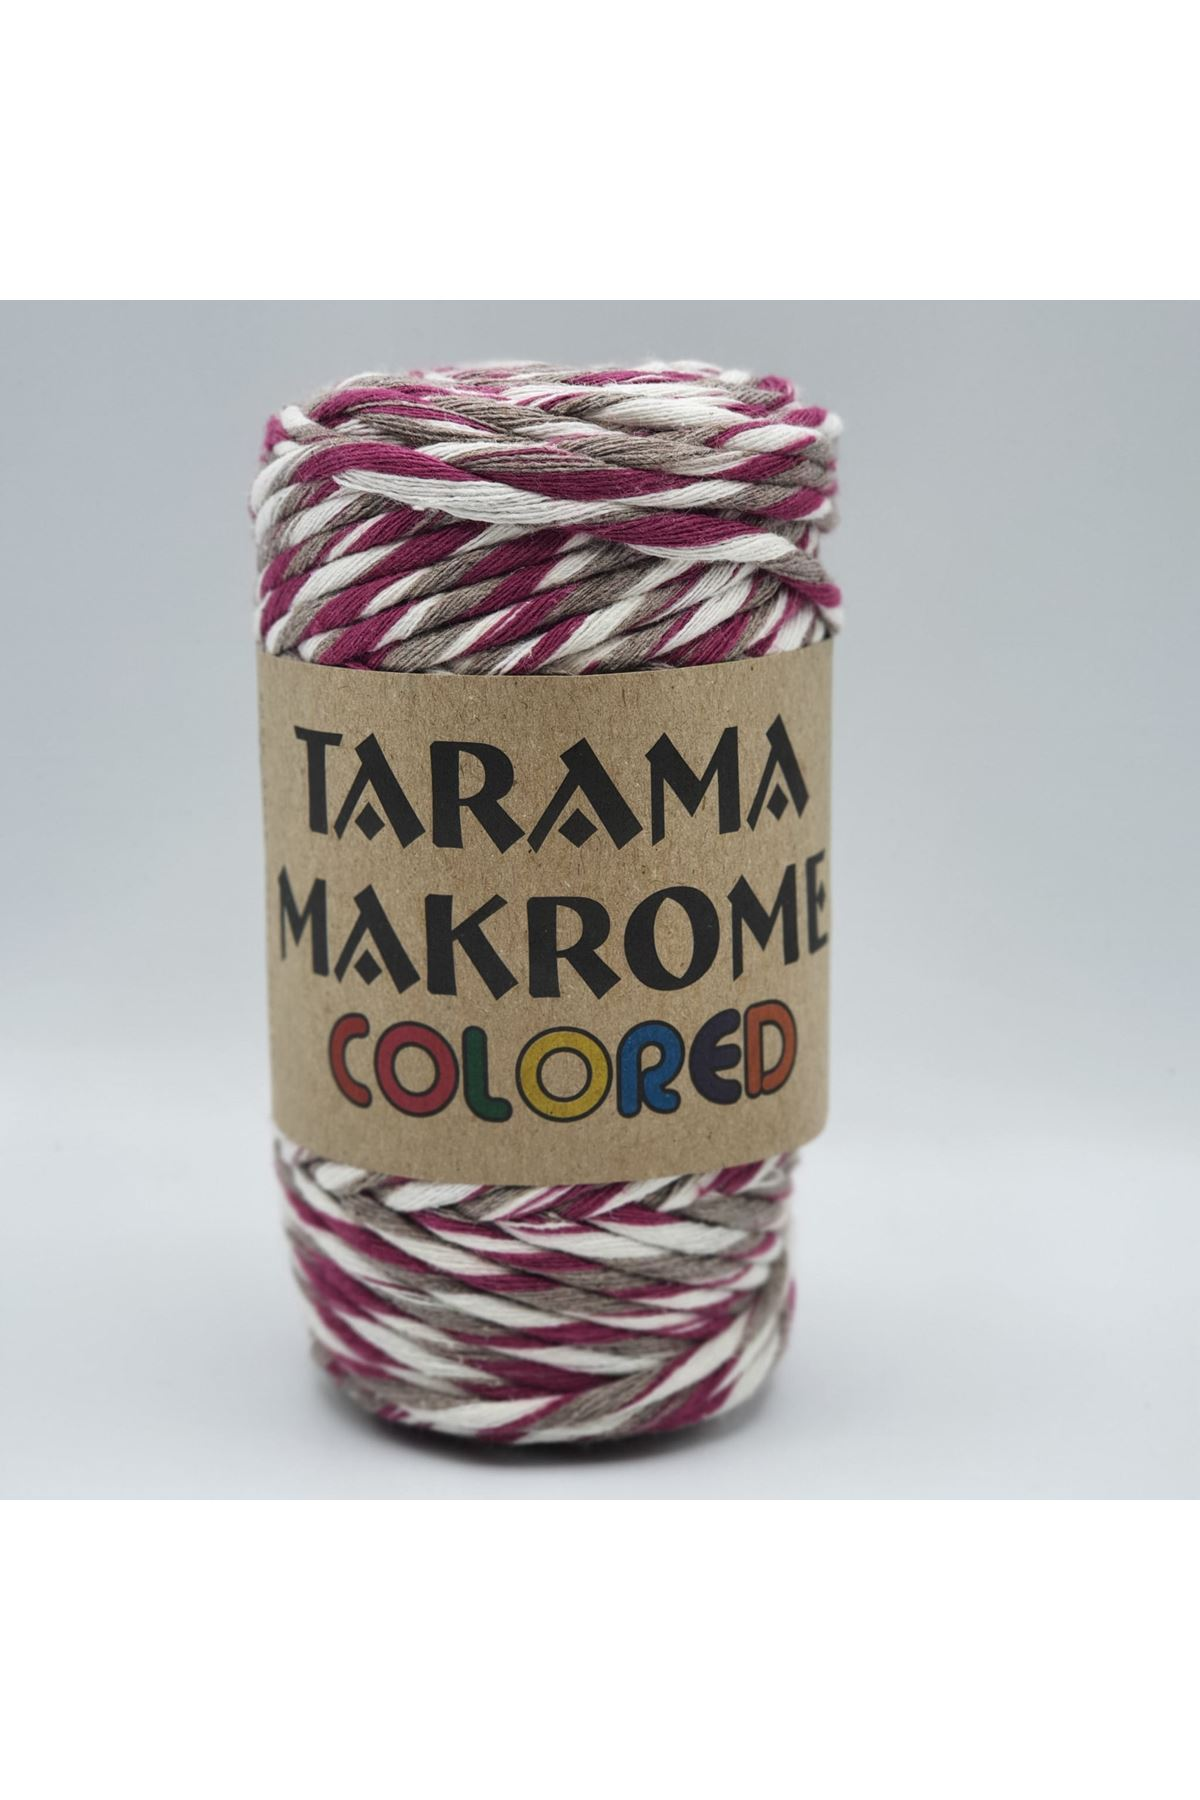 Tarama Makrome Colored 5 mm - 08